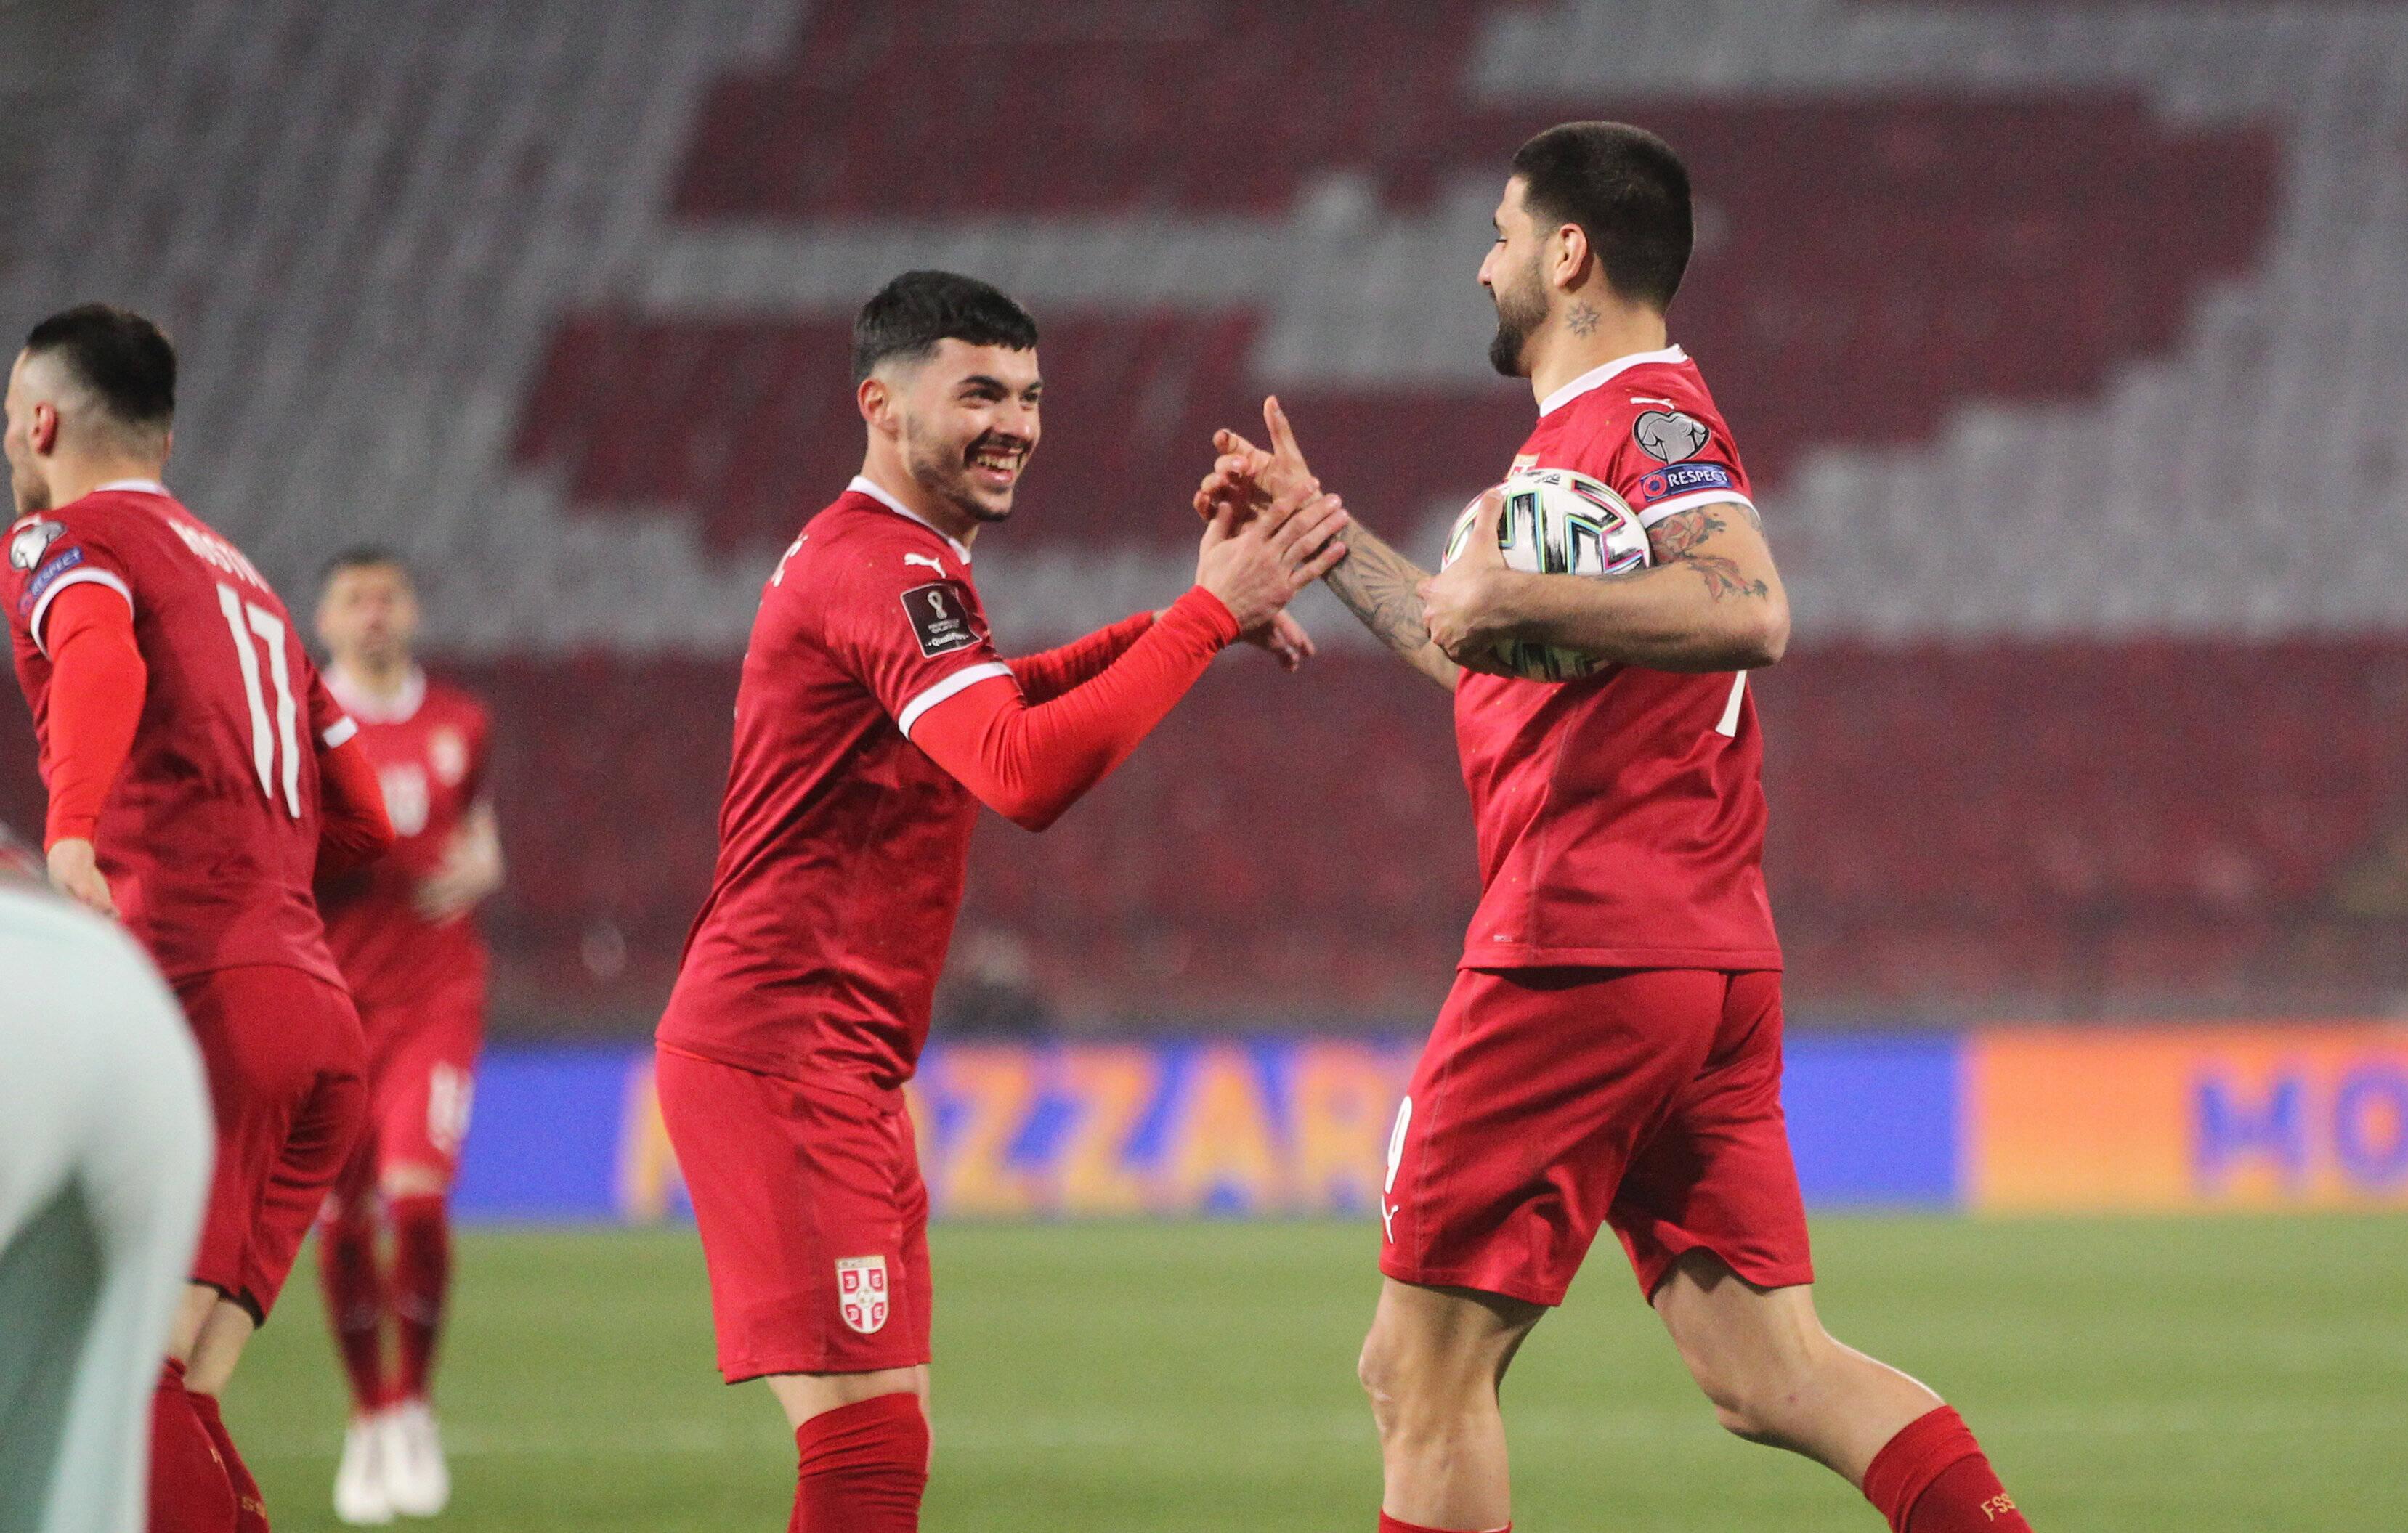 Nemanja Radonjić and  Aleksandar Mitrović celebrate a goal.